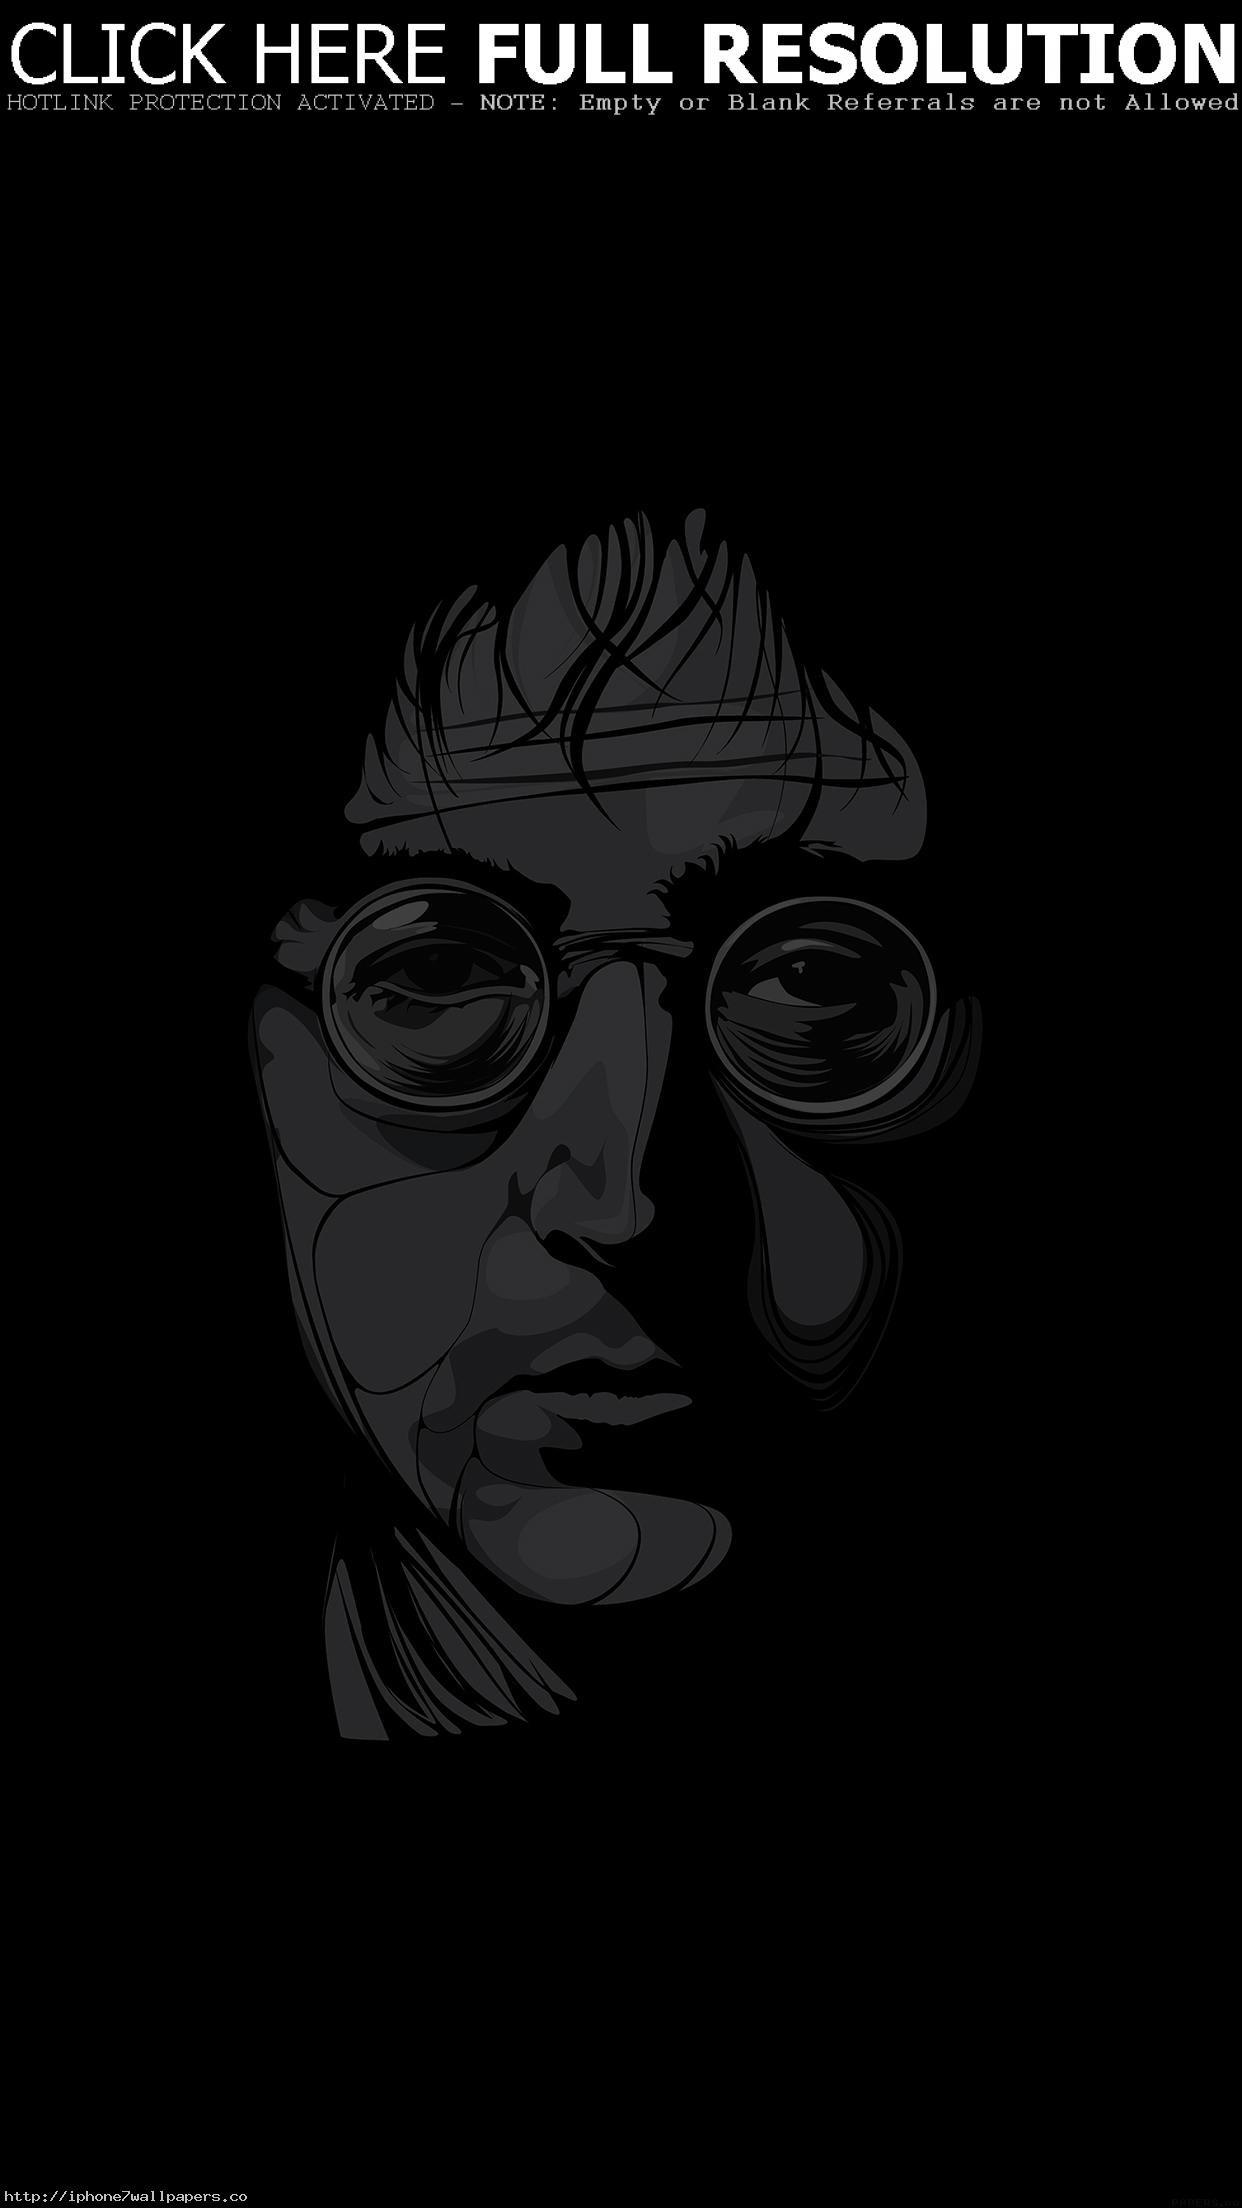 1242x2208 John Lennon Il Art Music Android Wallpaper Hd Wallpapers